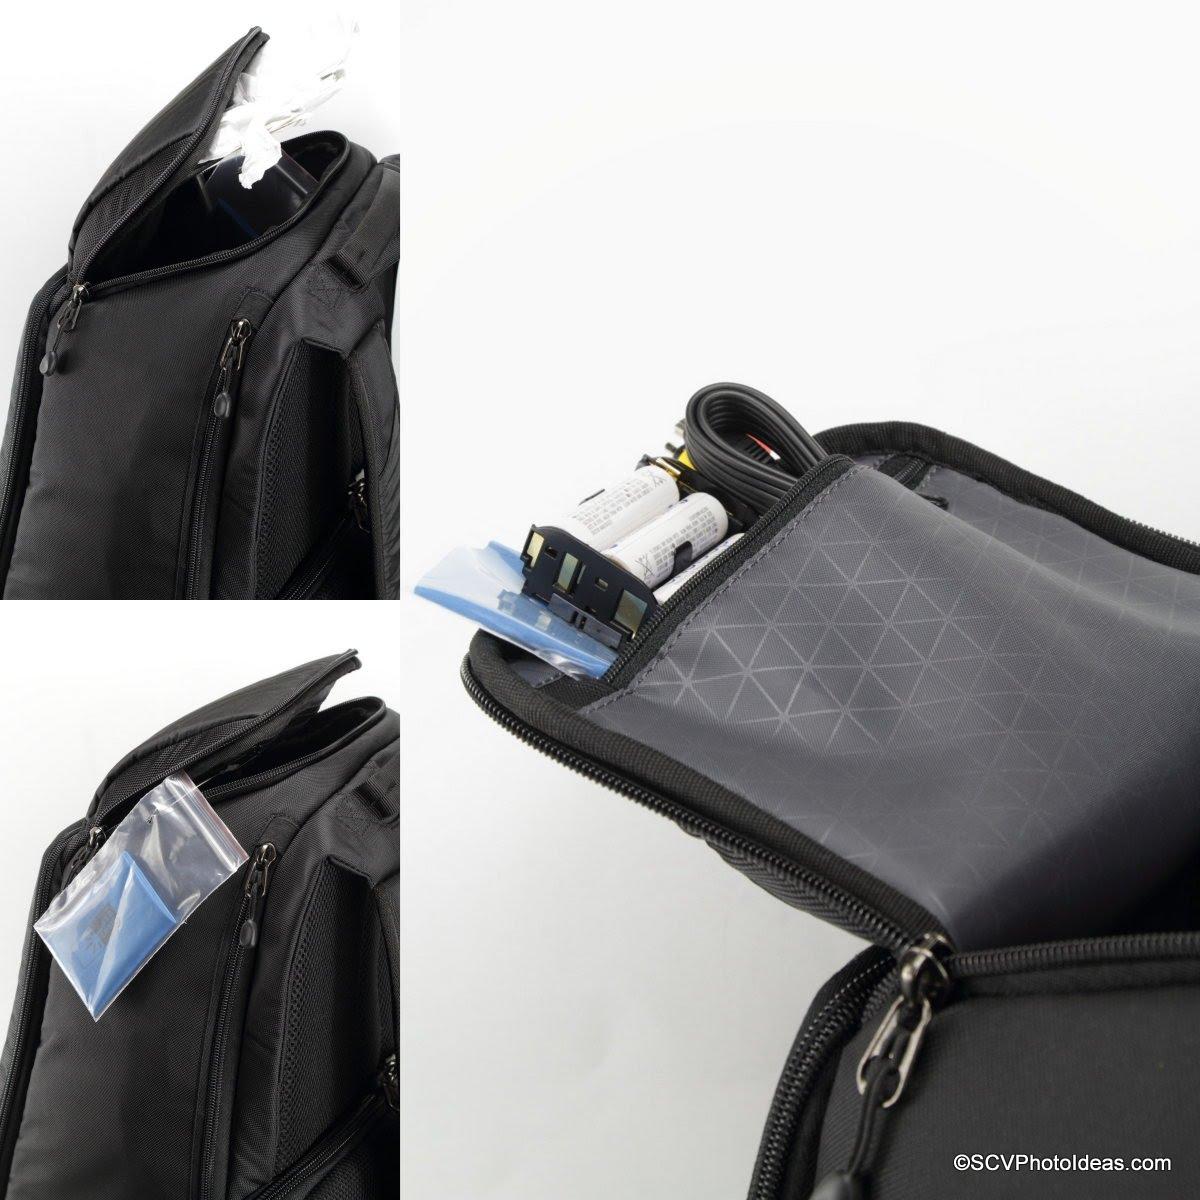 Case Logic DSB-103 top compartment zippered lid pocket